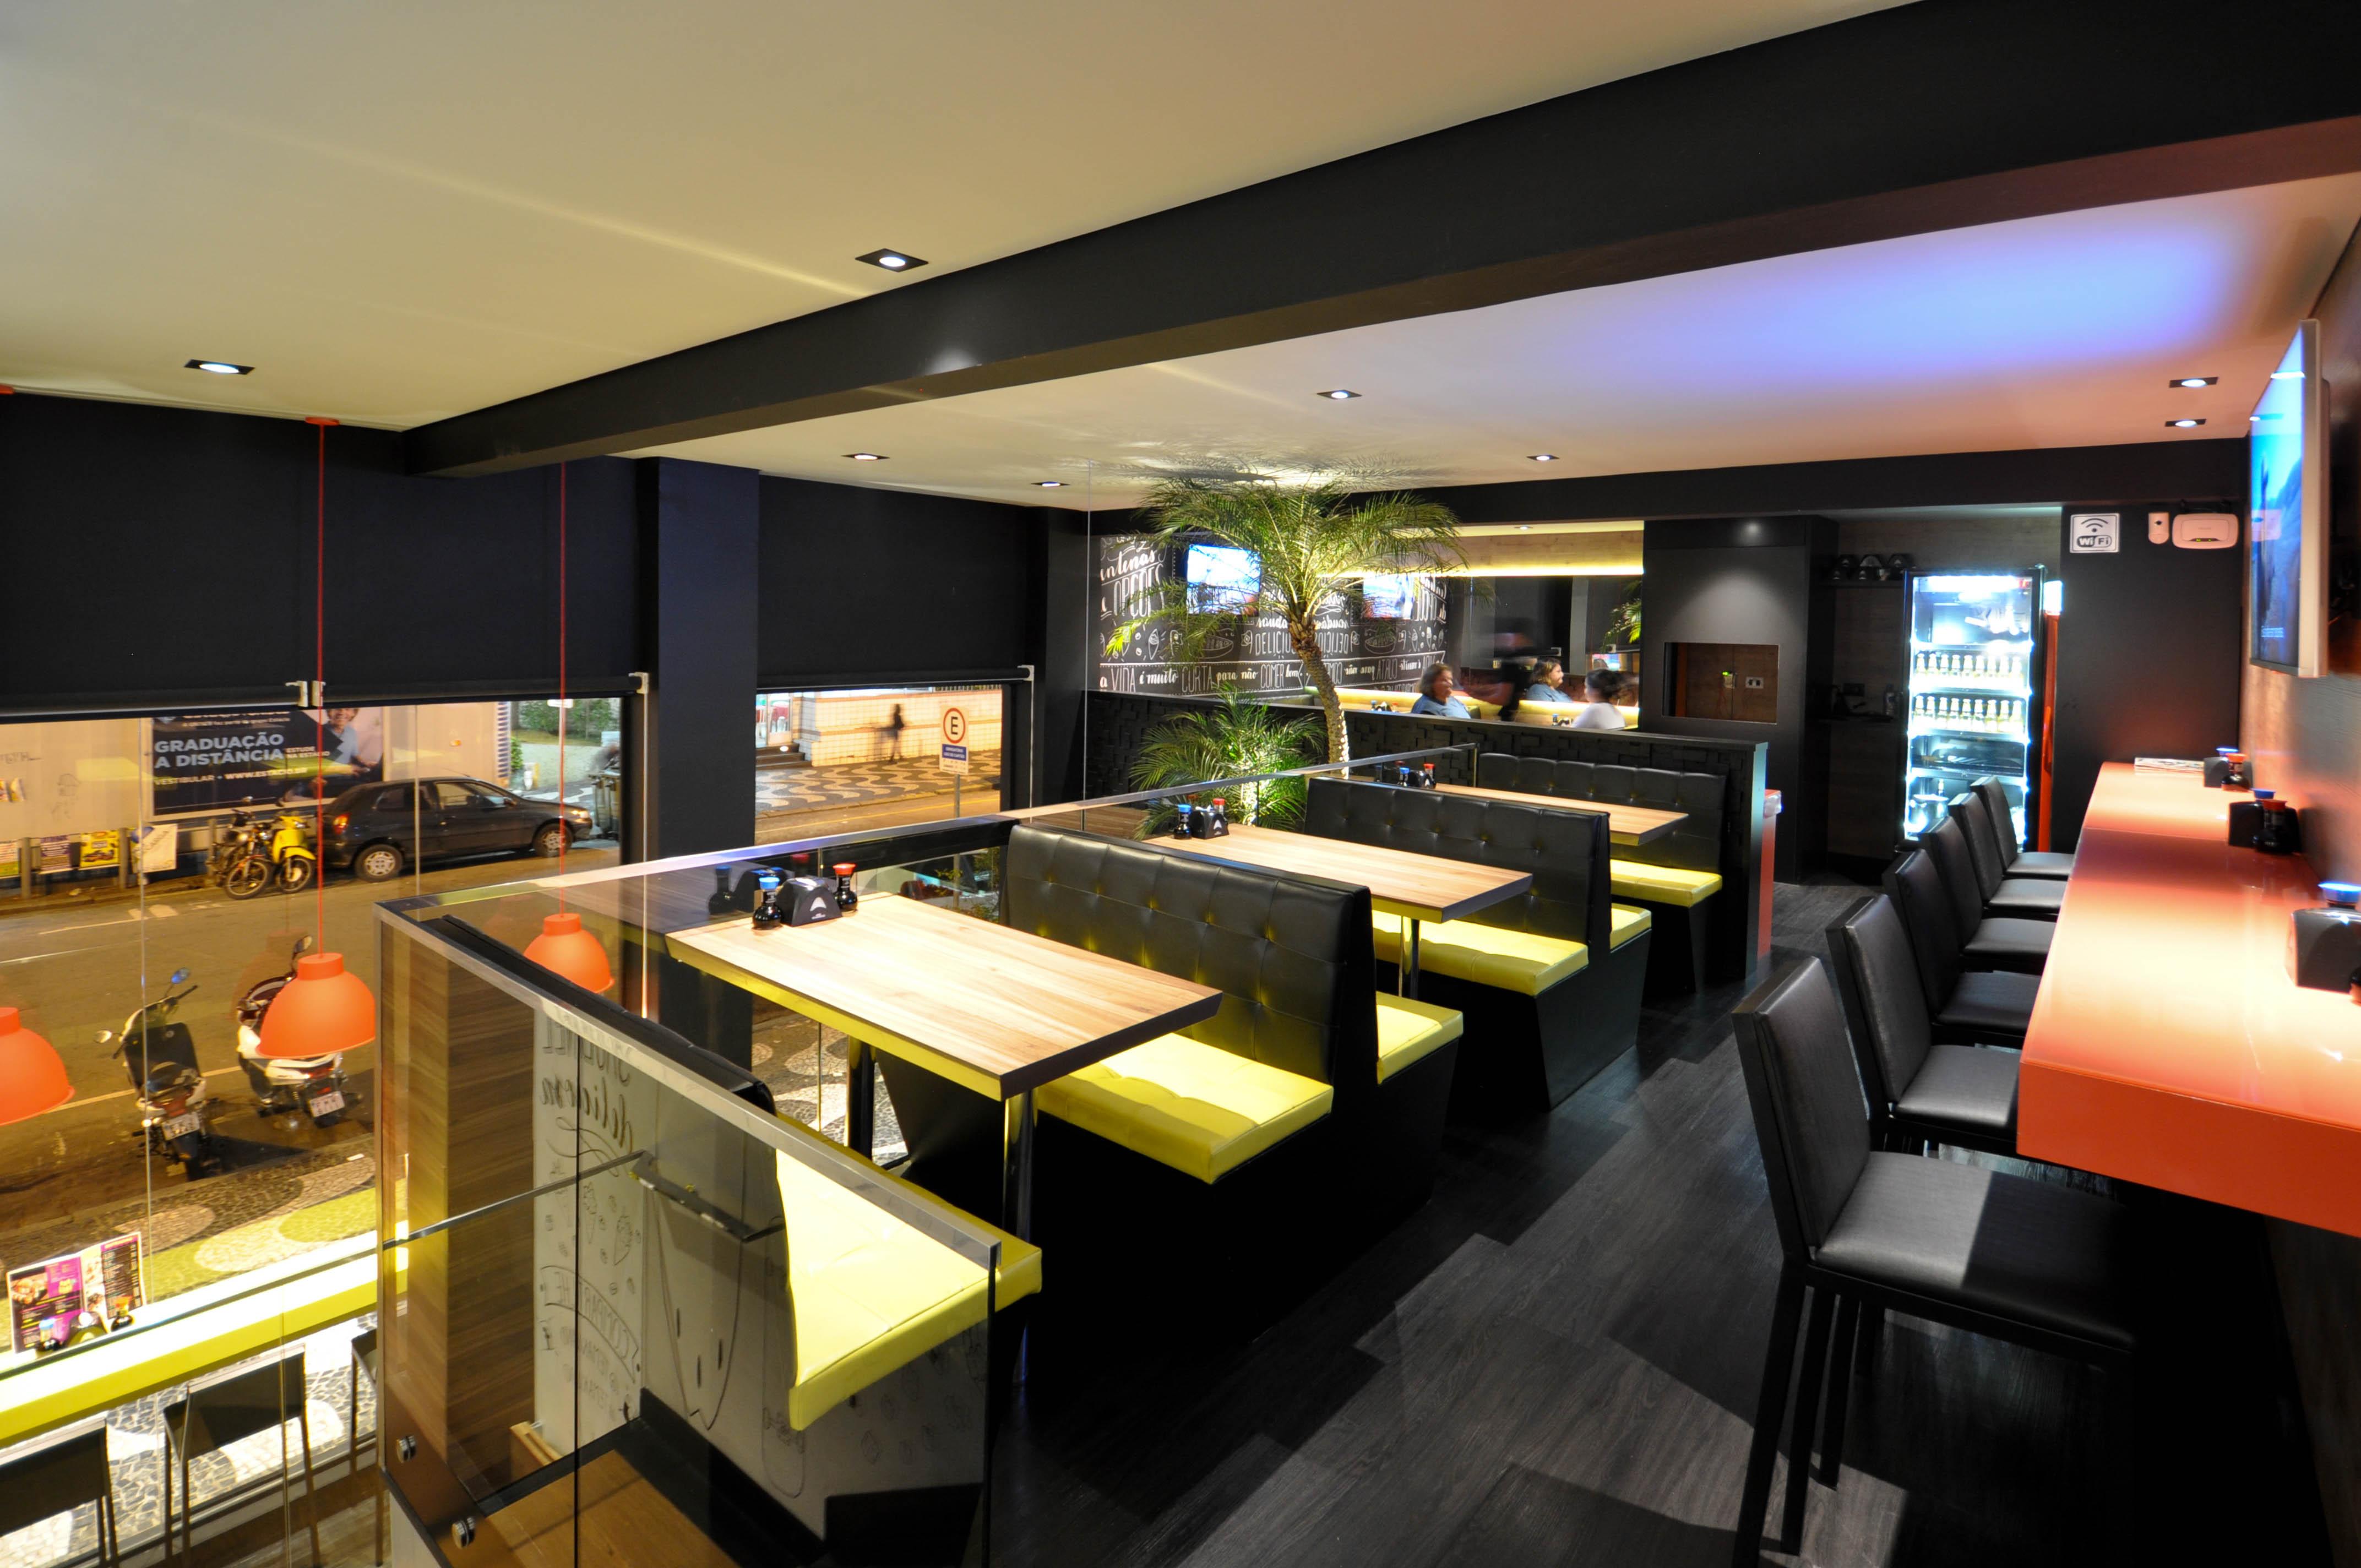 temakiland-temakeria-restaurante-interiores-design-mazzark